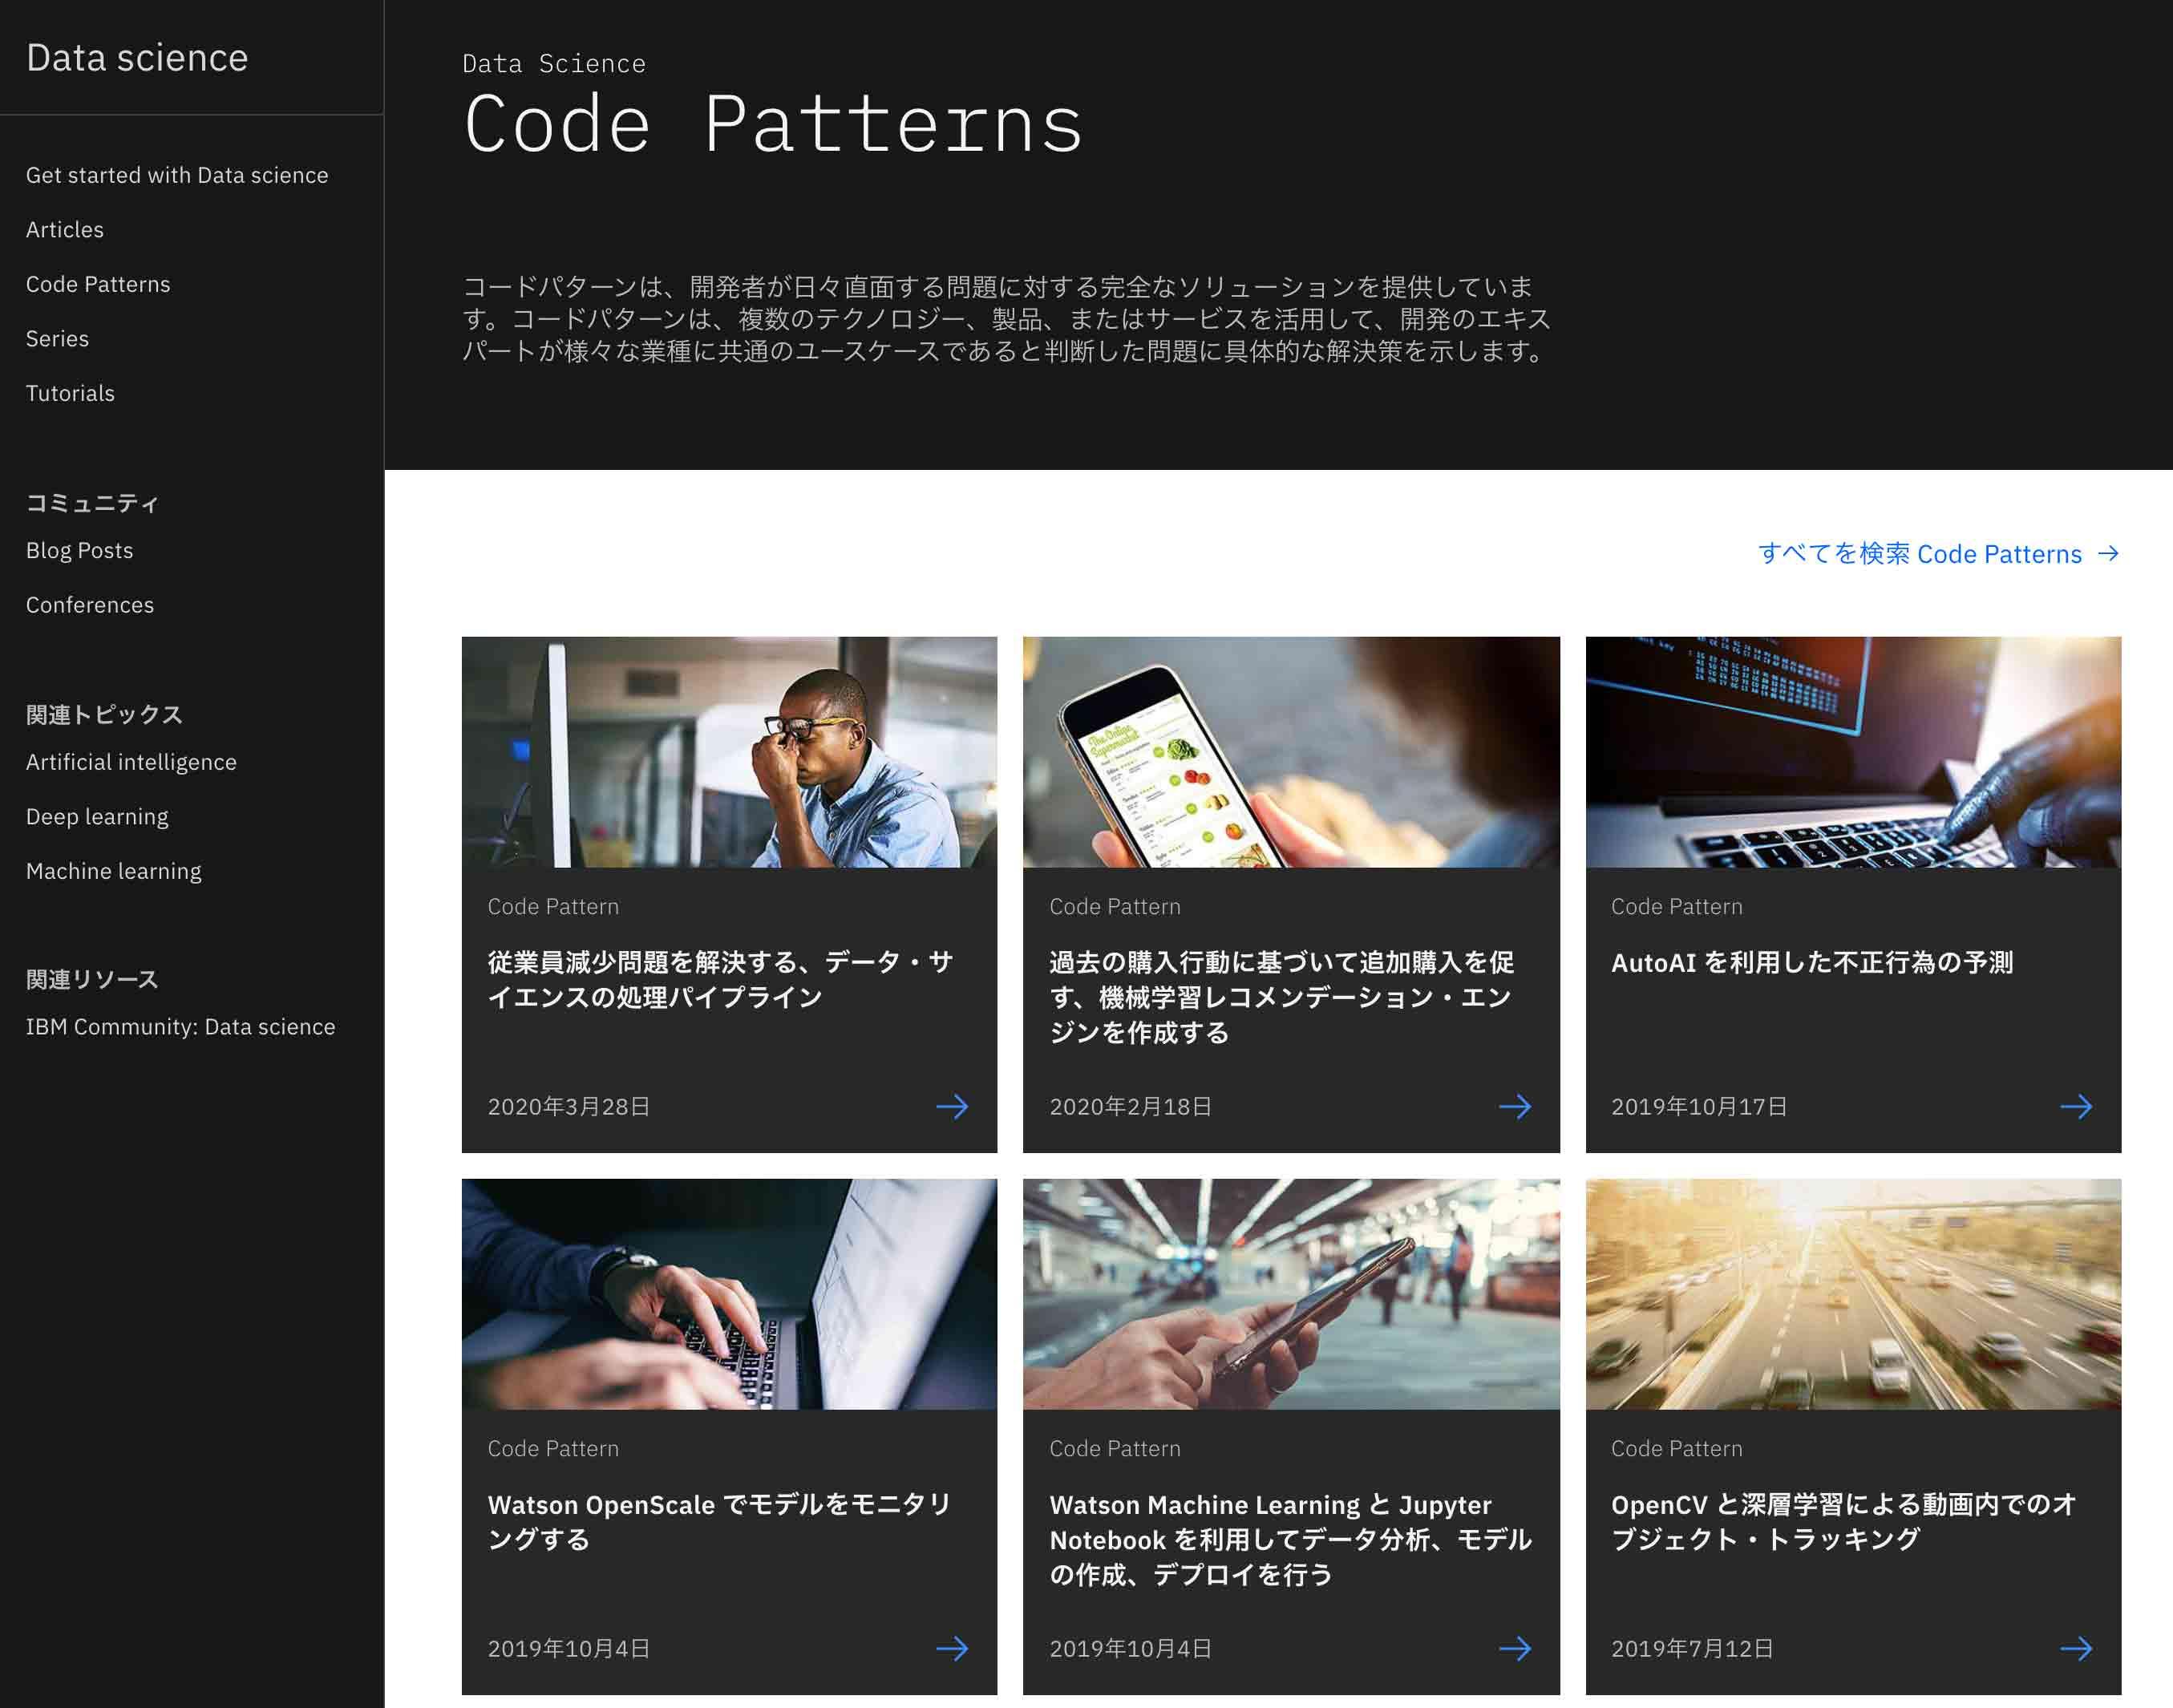 Code Patterns